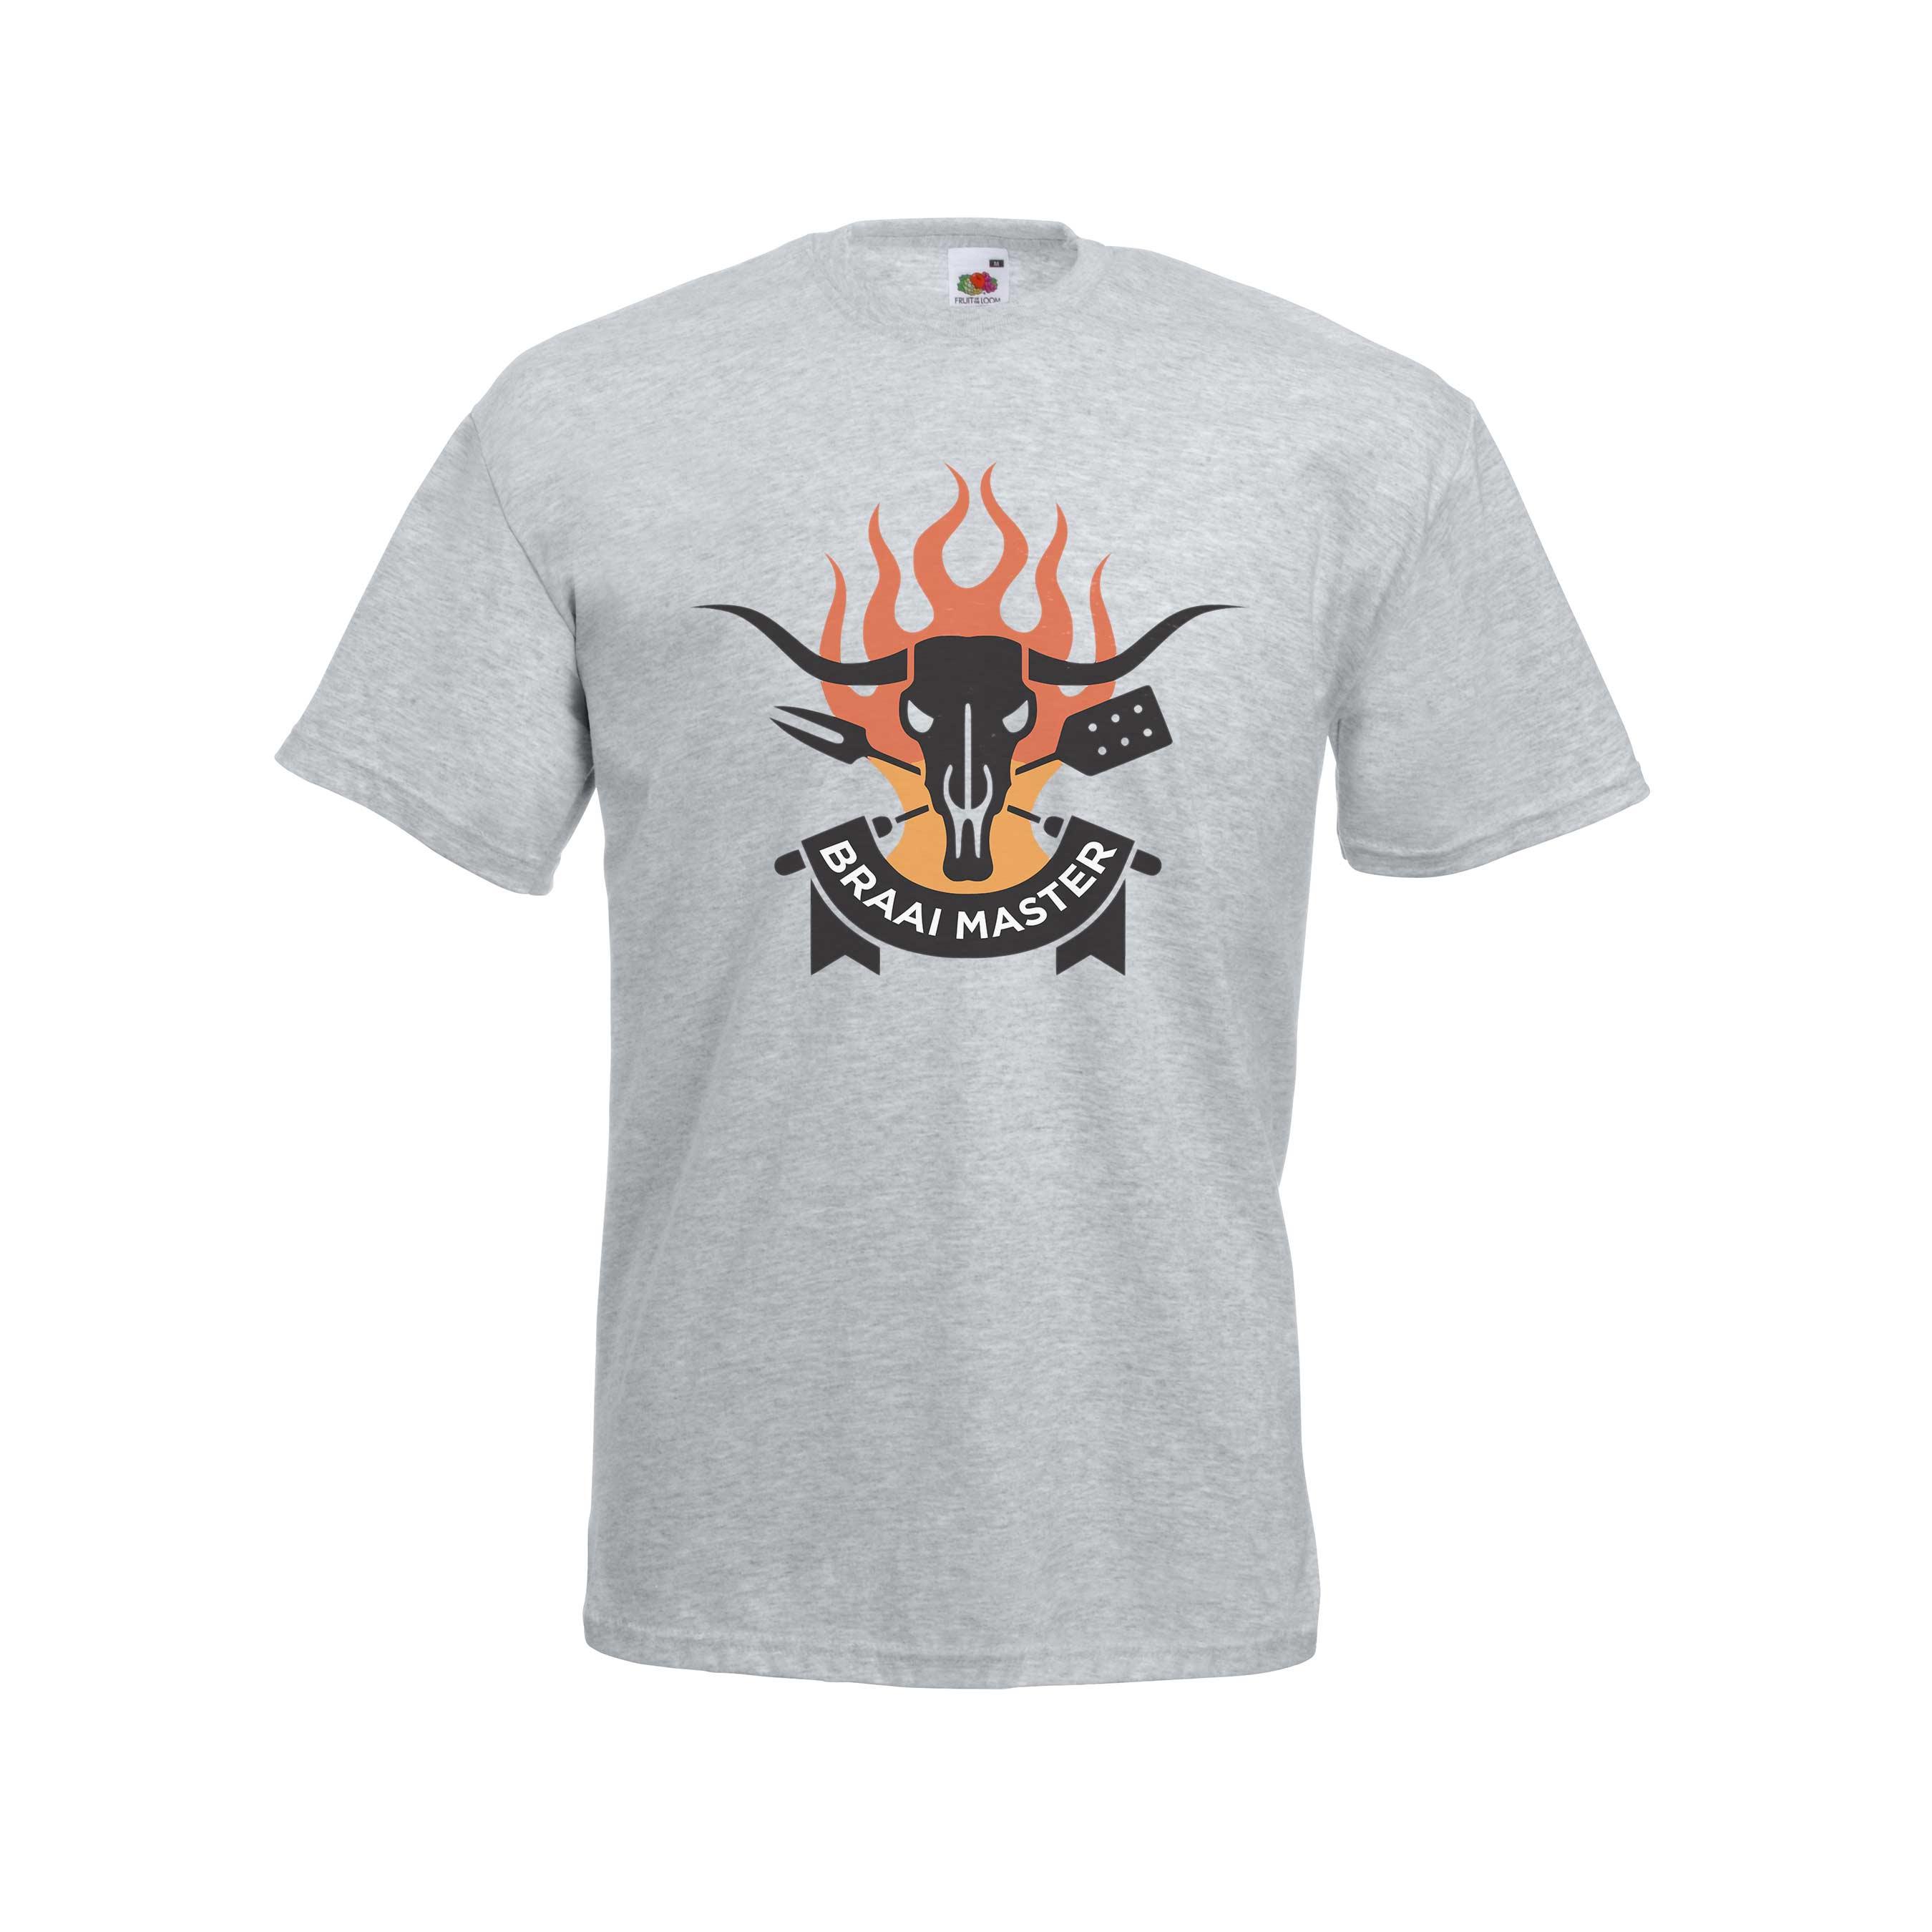 Braai Master design for t-shirt, hoodie & sweatshirt